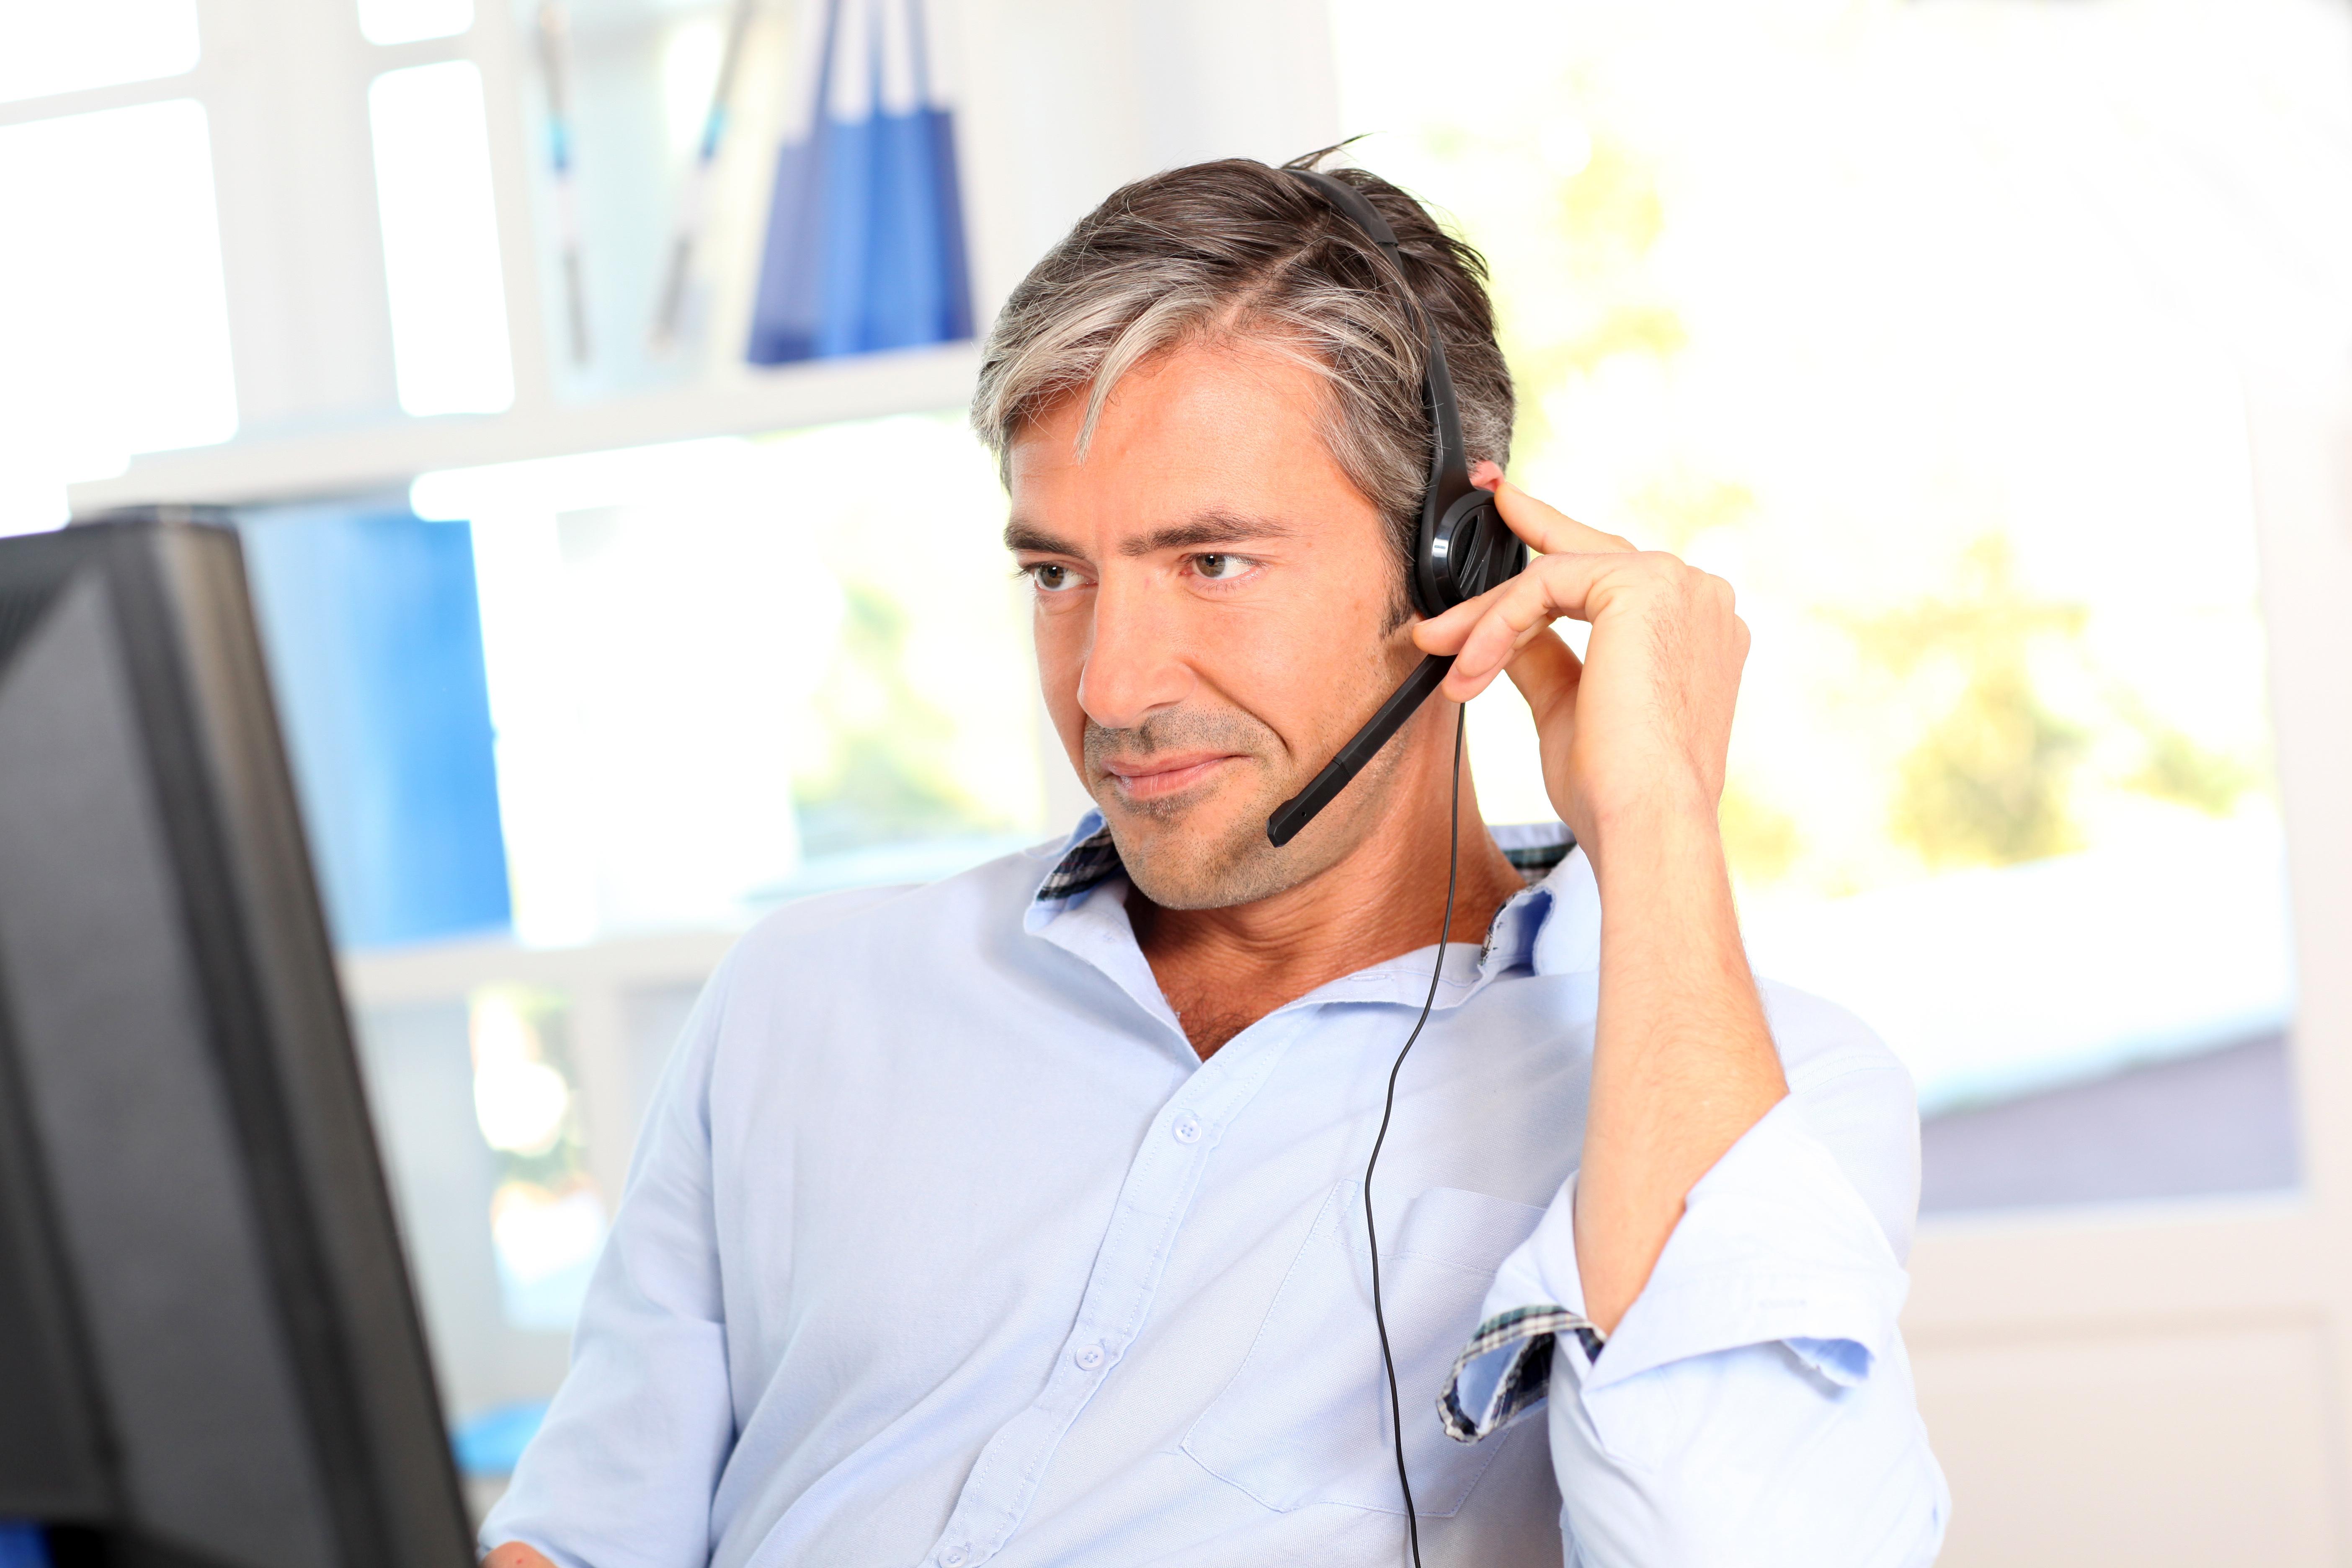 Kontaktformular Elektronikversicherung